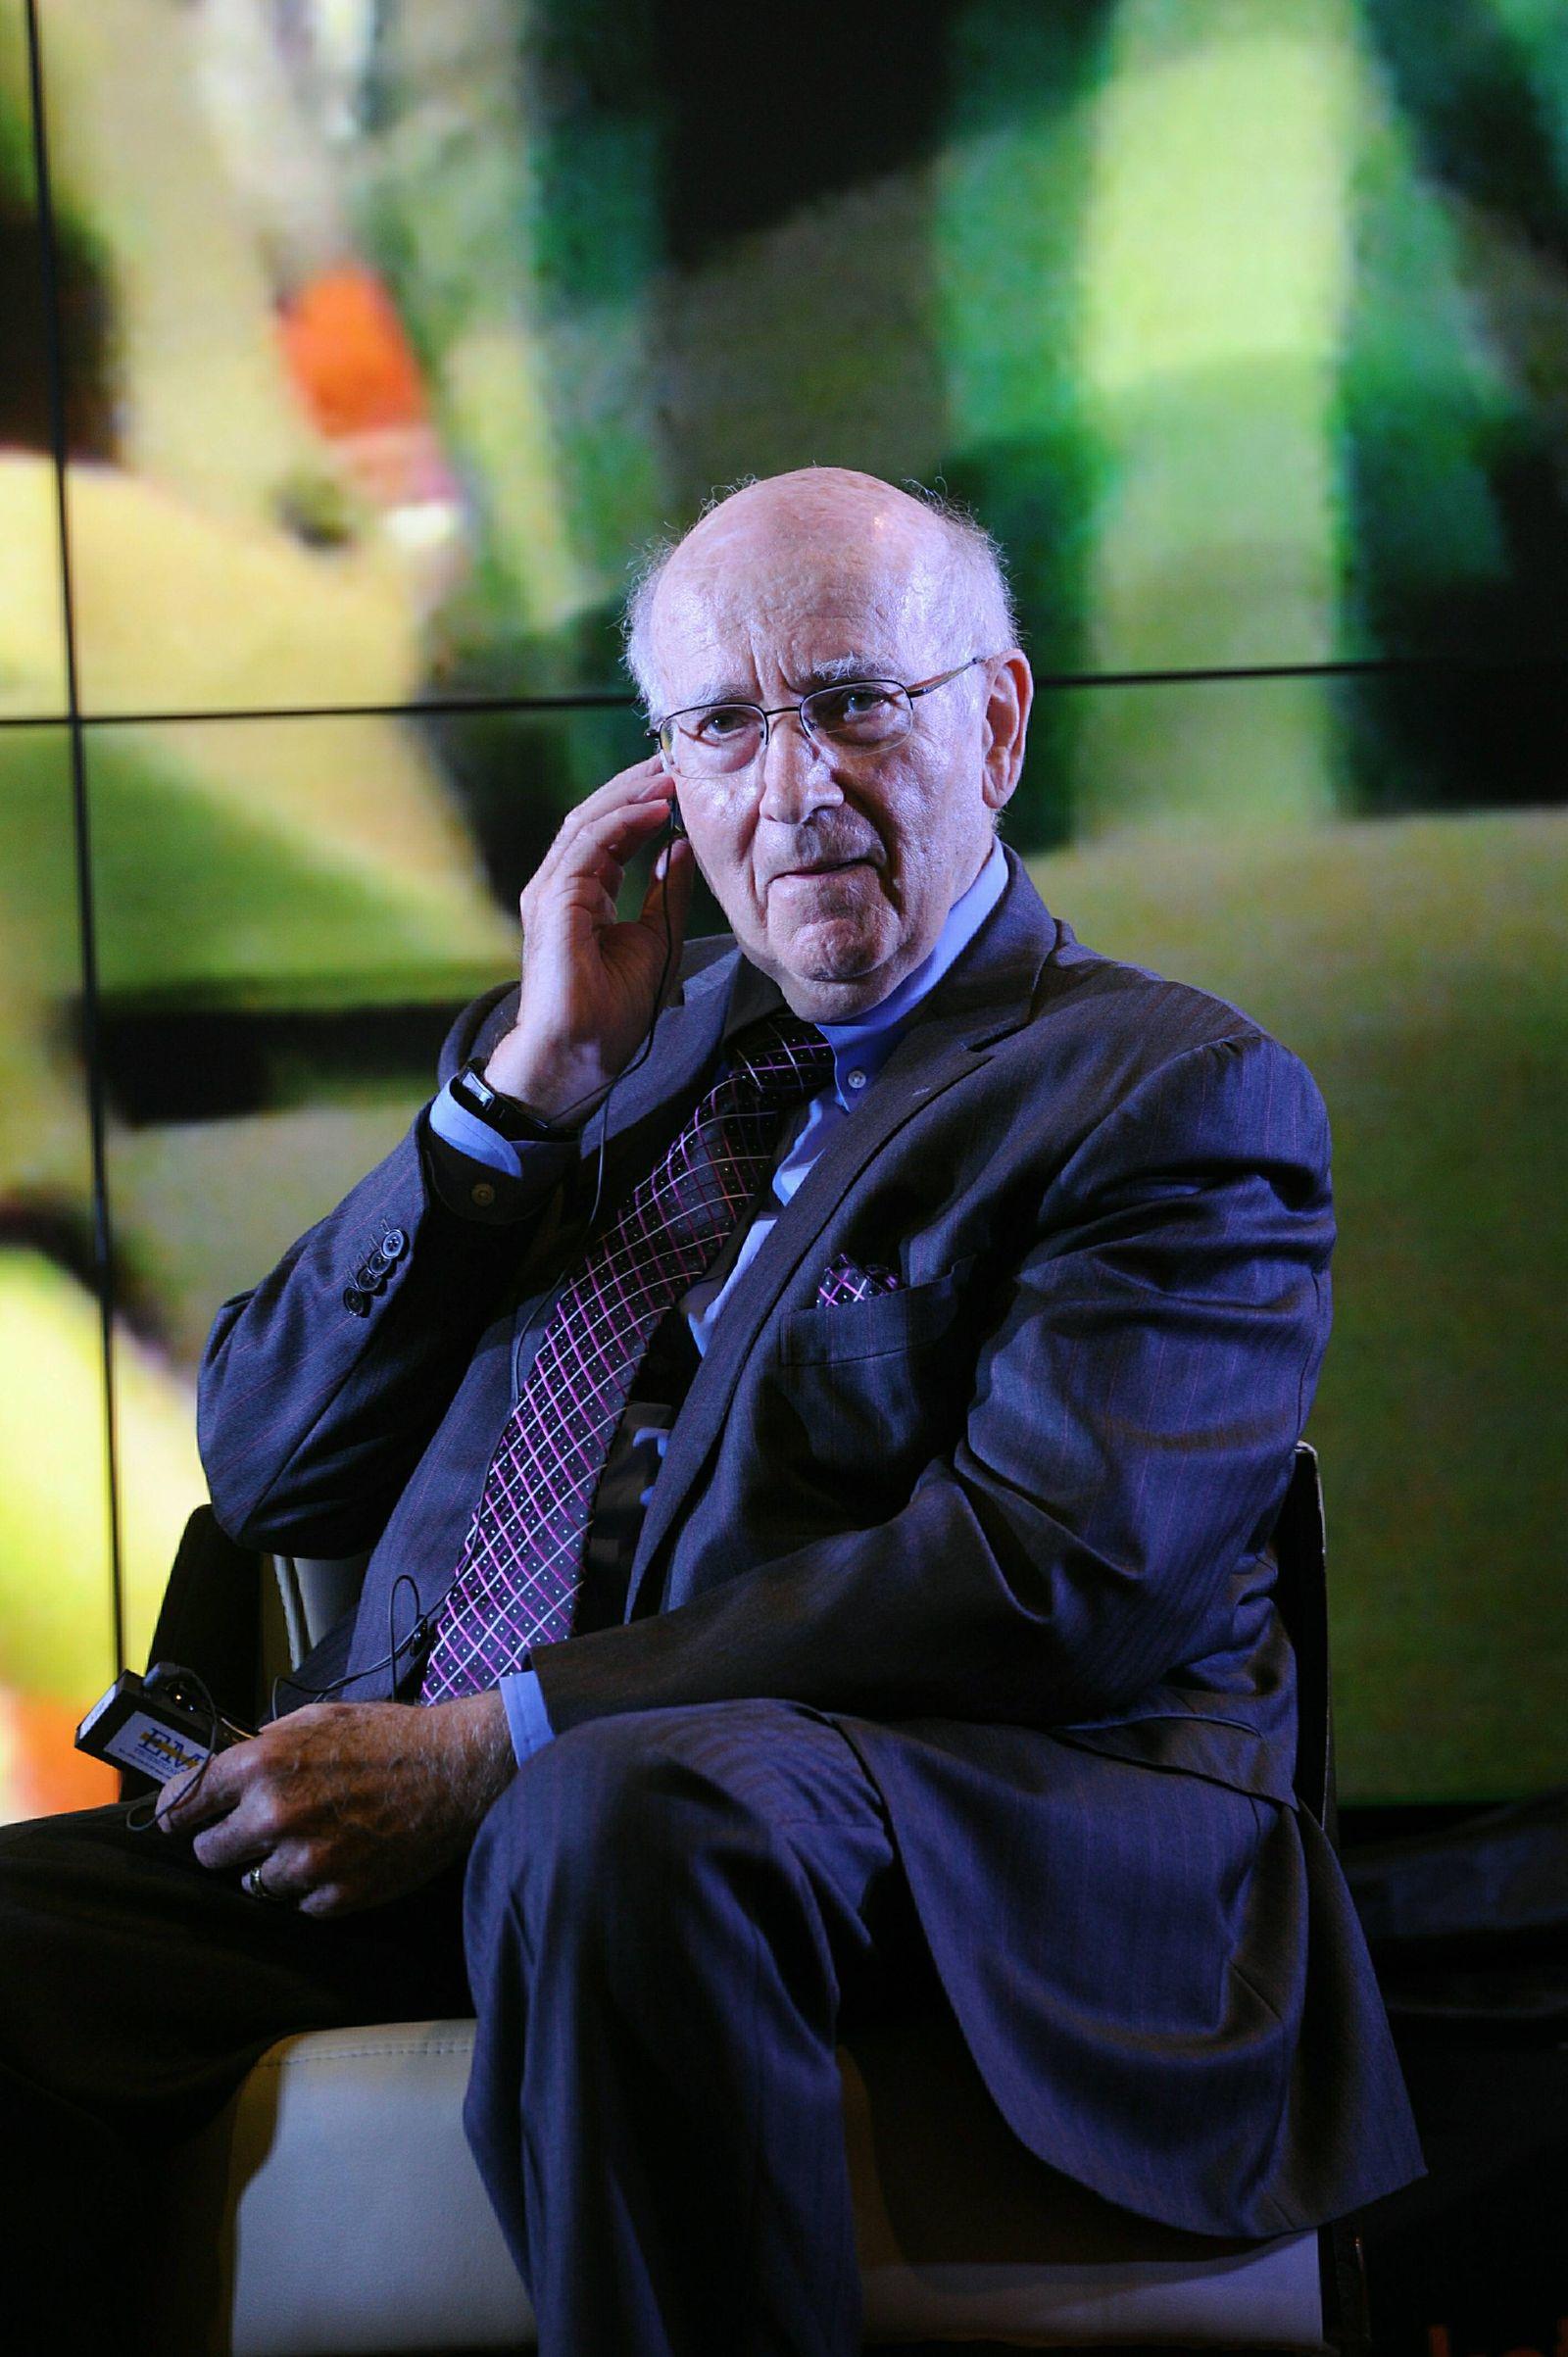 Marketing expert Philip Kotler during a news conference on the Kotler Awards at the Sokolniki Exhibi